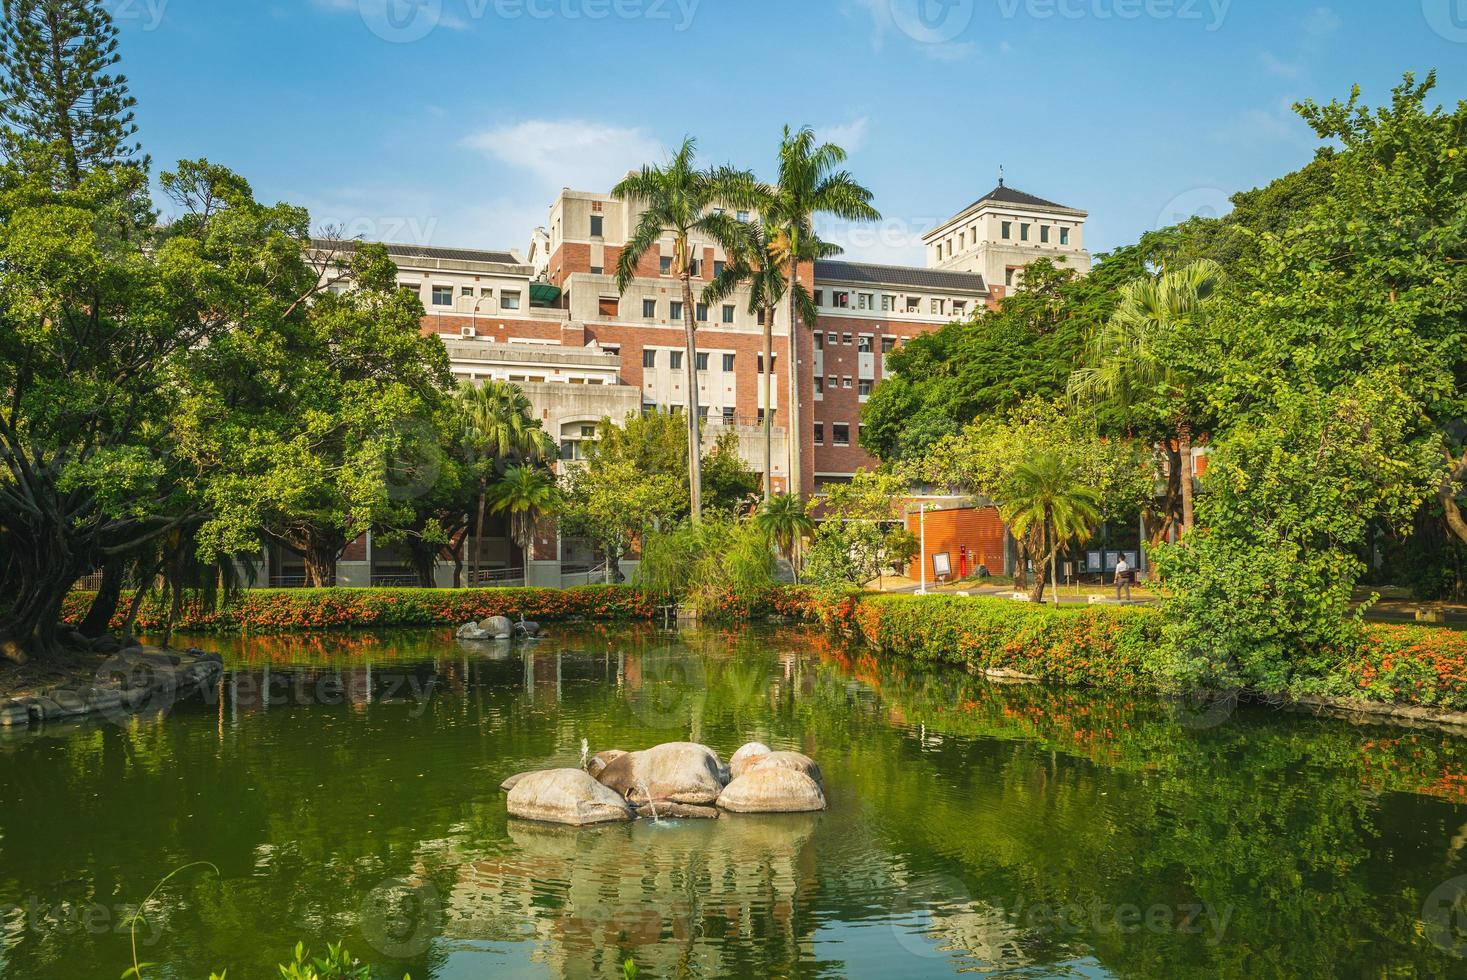 Campus of National Cheng Kung University in Tainan, taiwan photo